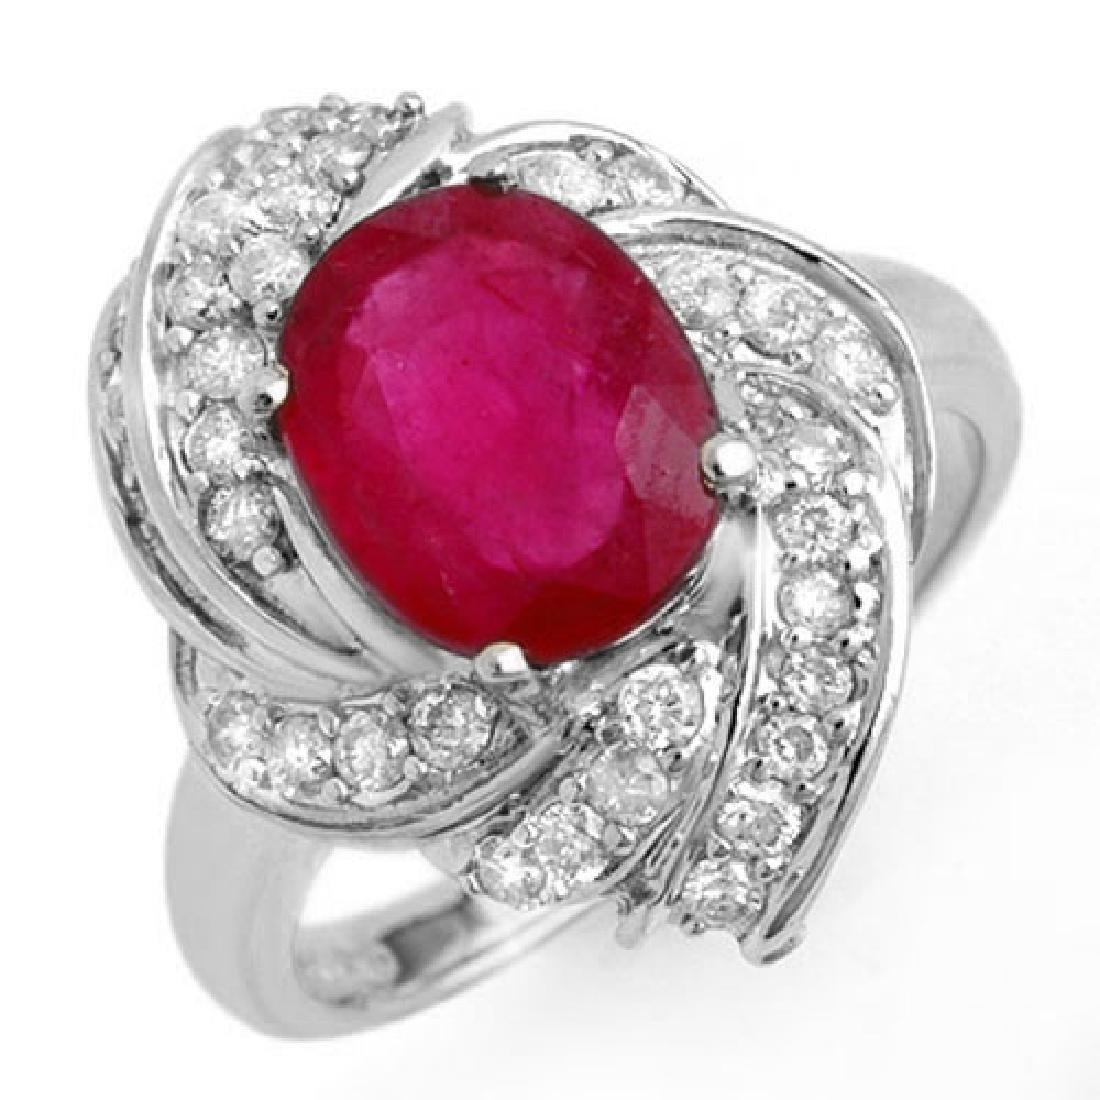 3.55 CTW Ruby & Diamond Ring 18K White Gold